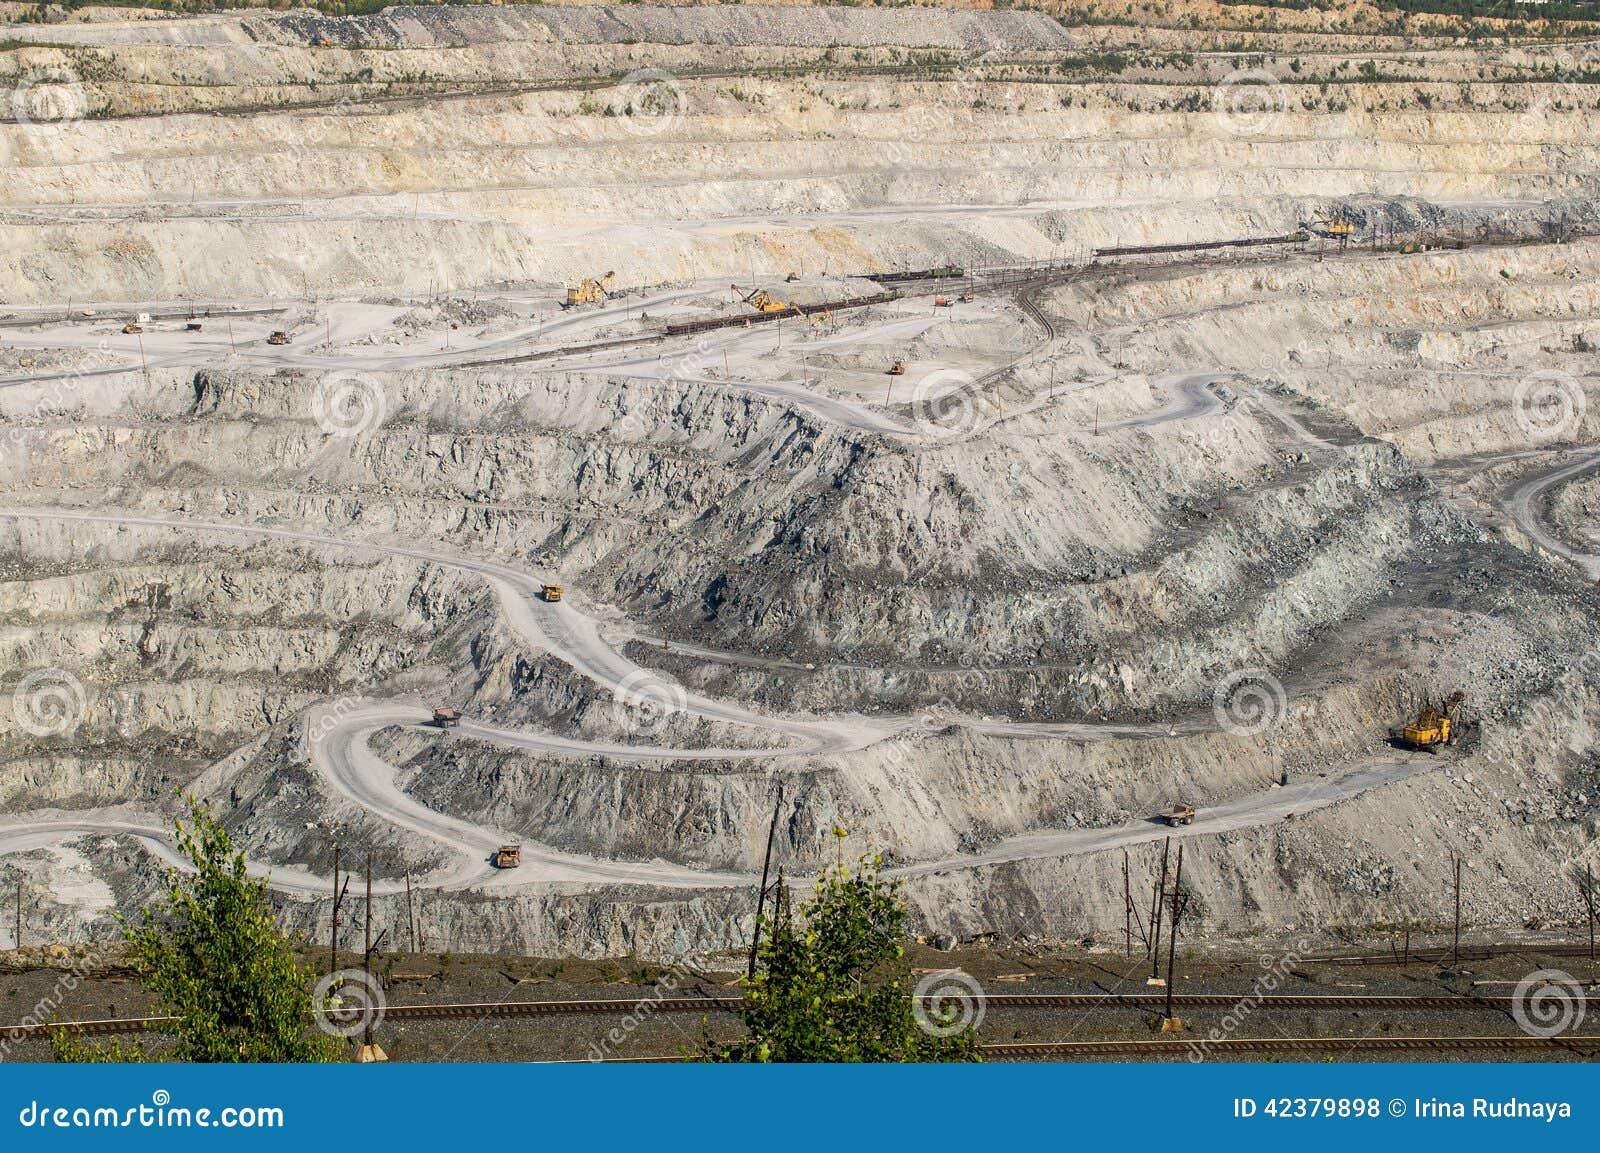 Asbestos Mining In Us : Open cast mine on mining operations in asbestos russia